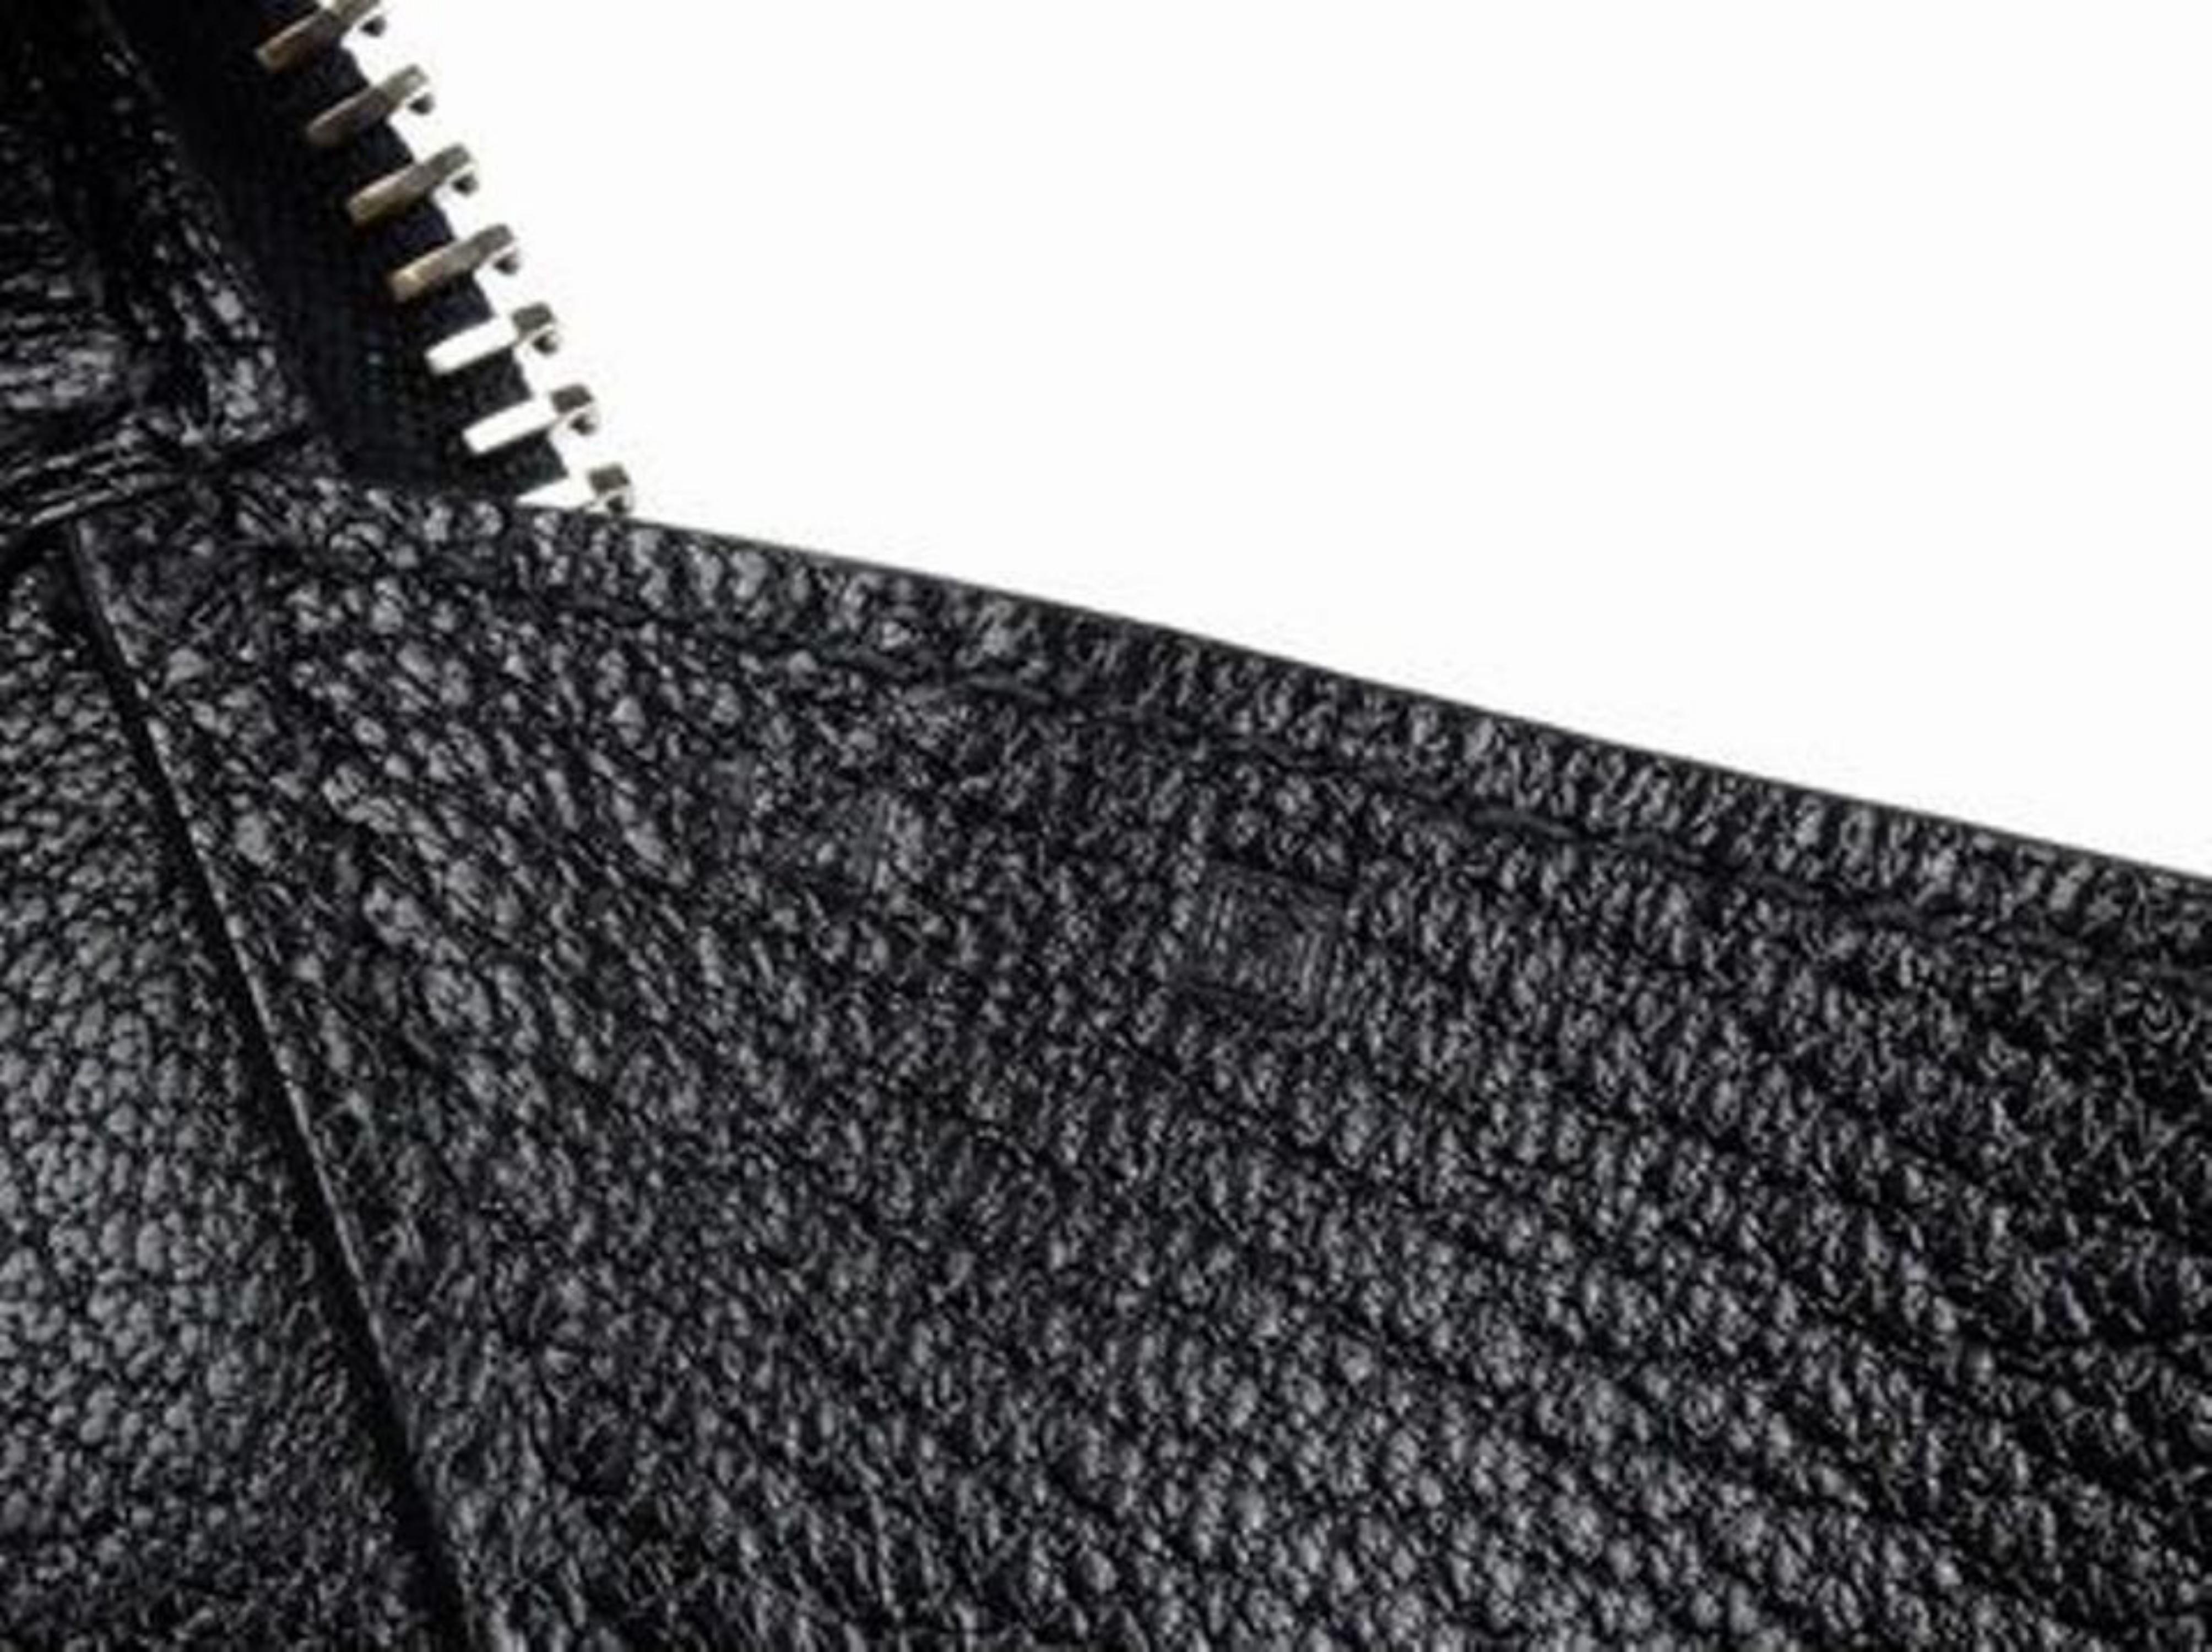 84650c3b27b7 Hermès Maxibox Evergrain 37 218575 Black Leather Hobo Bag For Sale at  1stdibs